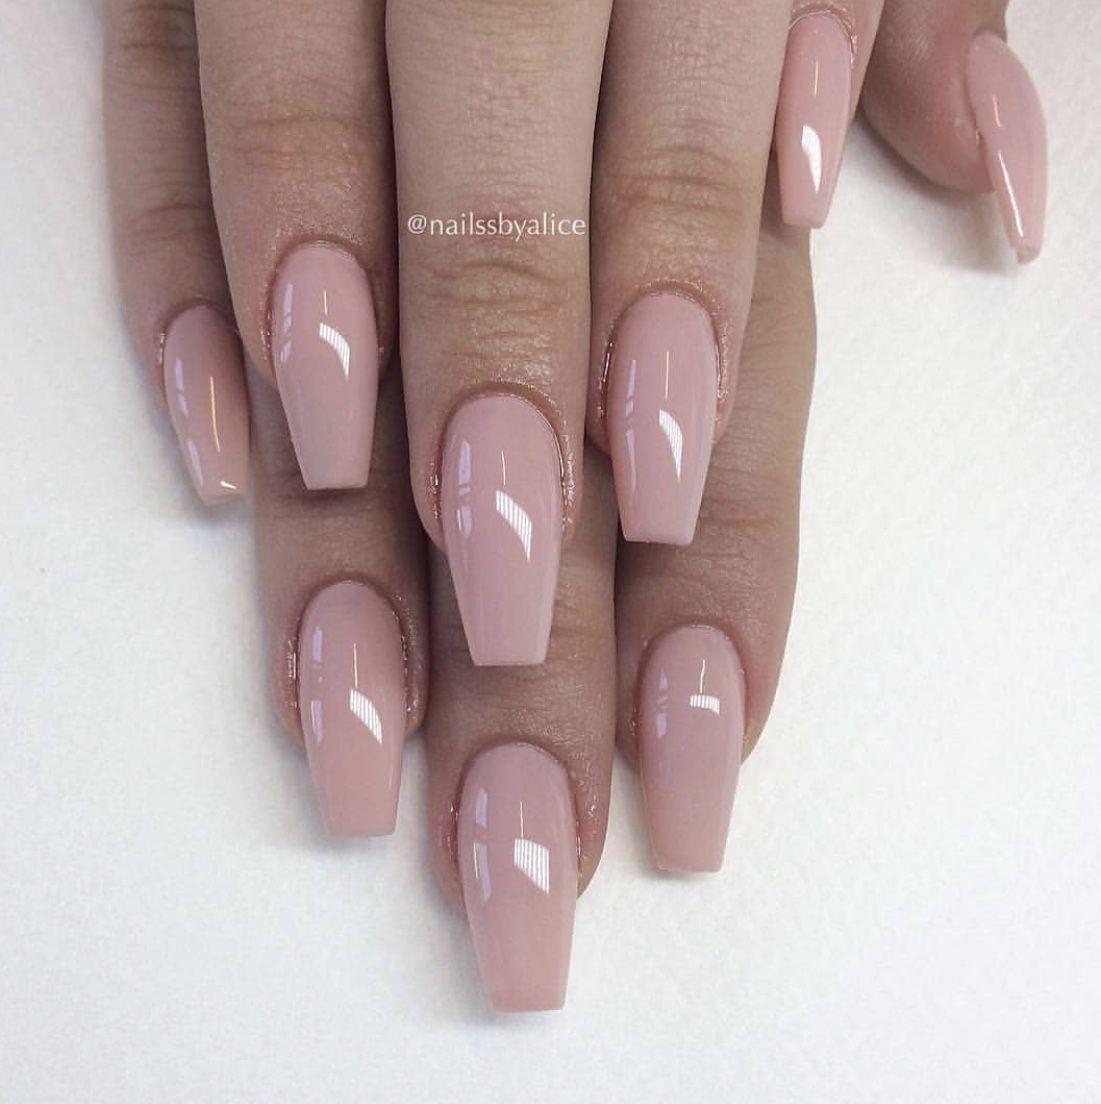 Full Frontal Fingernails: My Naked Nails